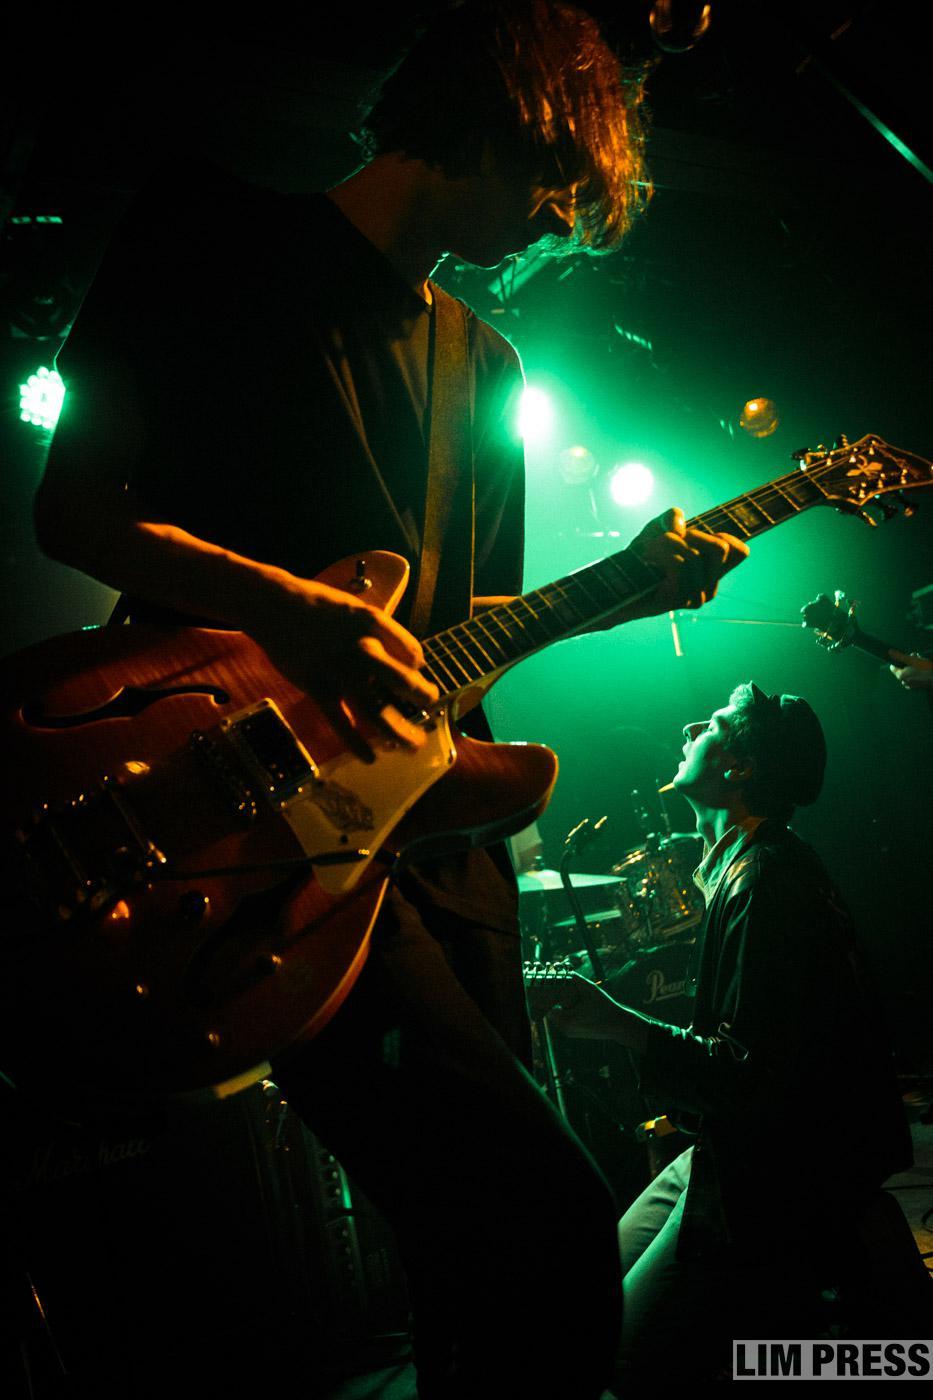 Isolation Berlin | 大阪 SOCORE FACTORY | 2019.02.03